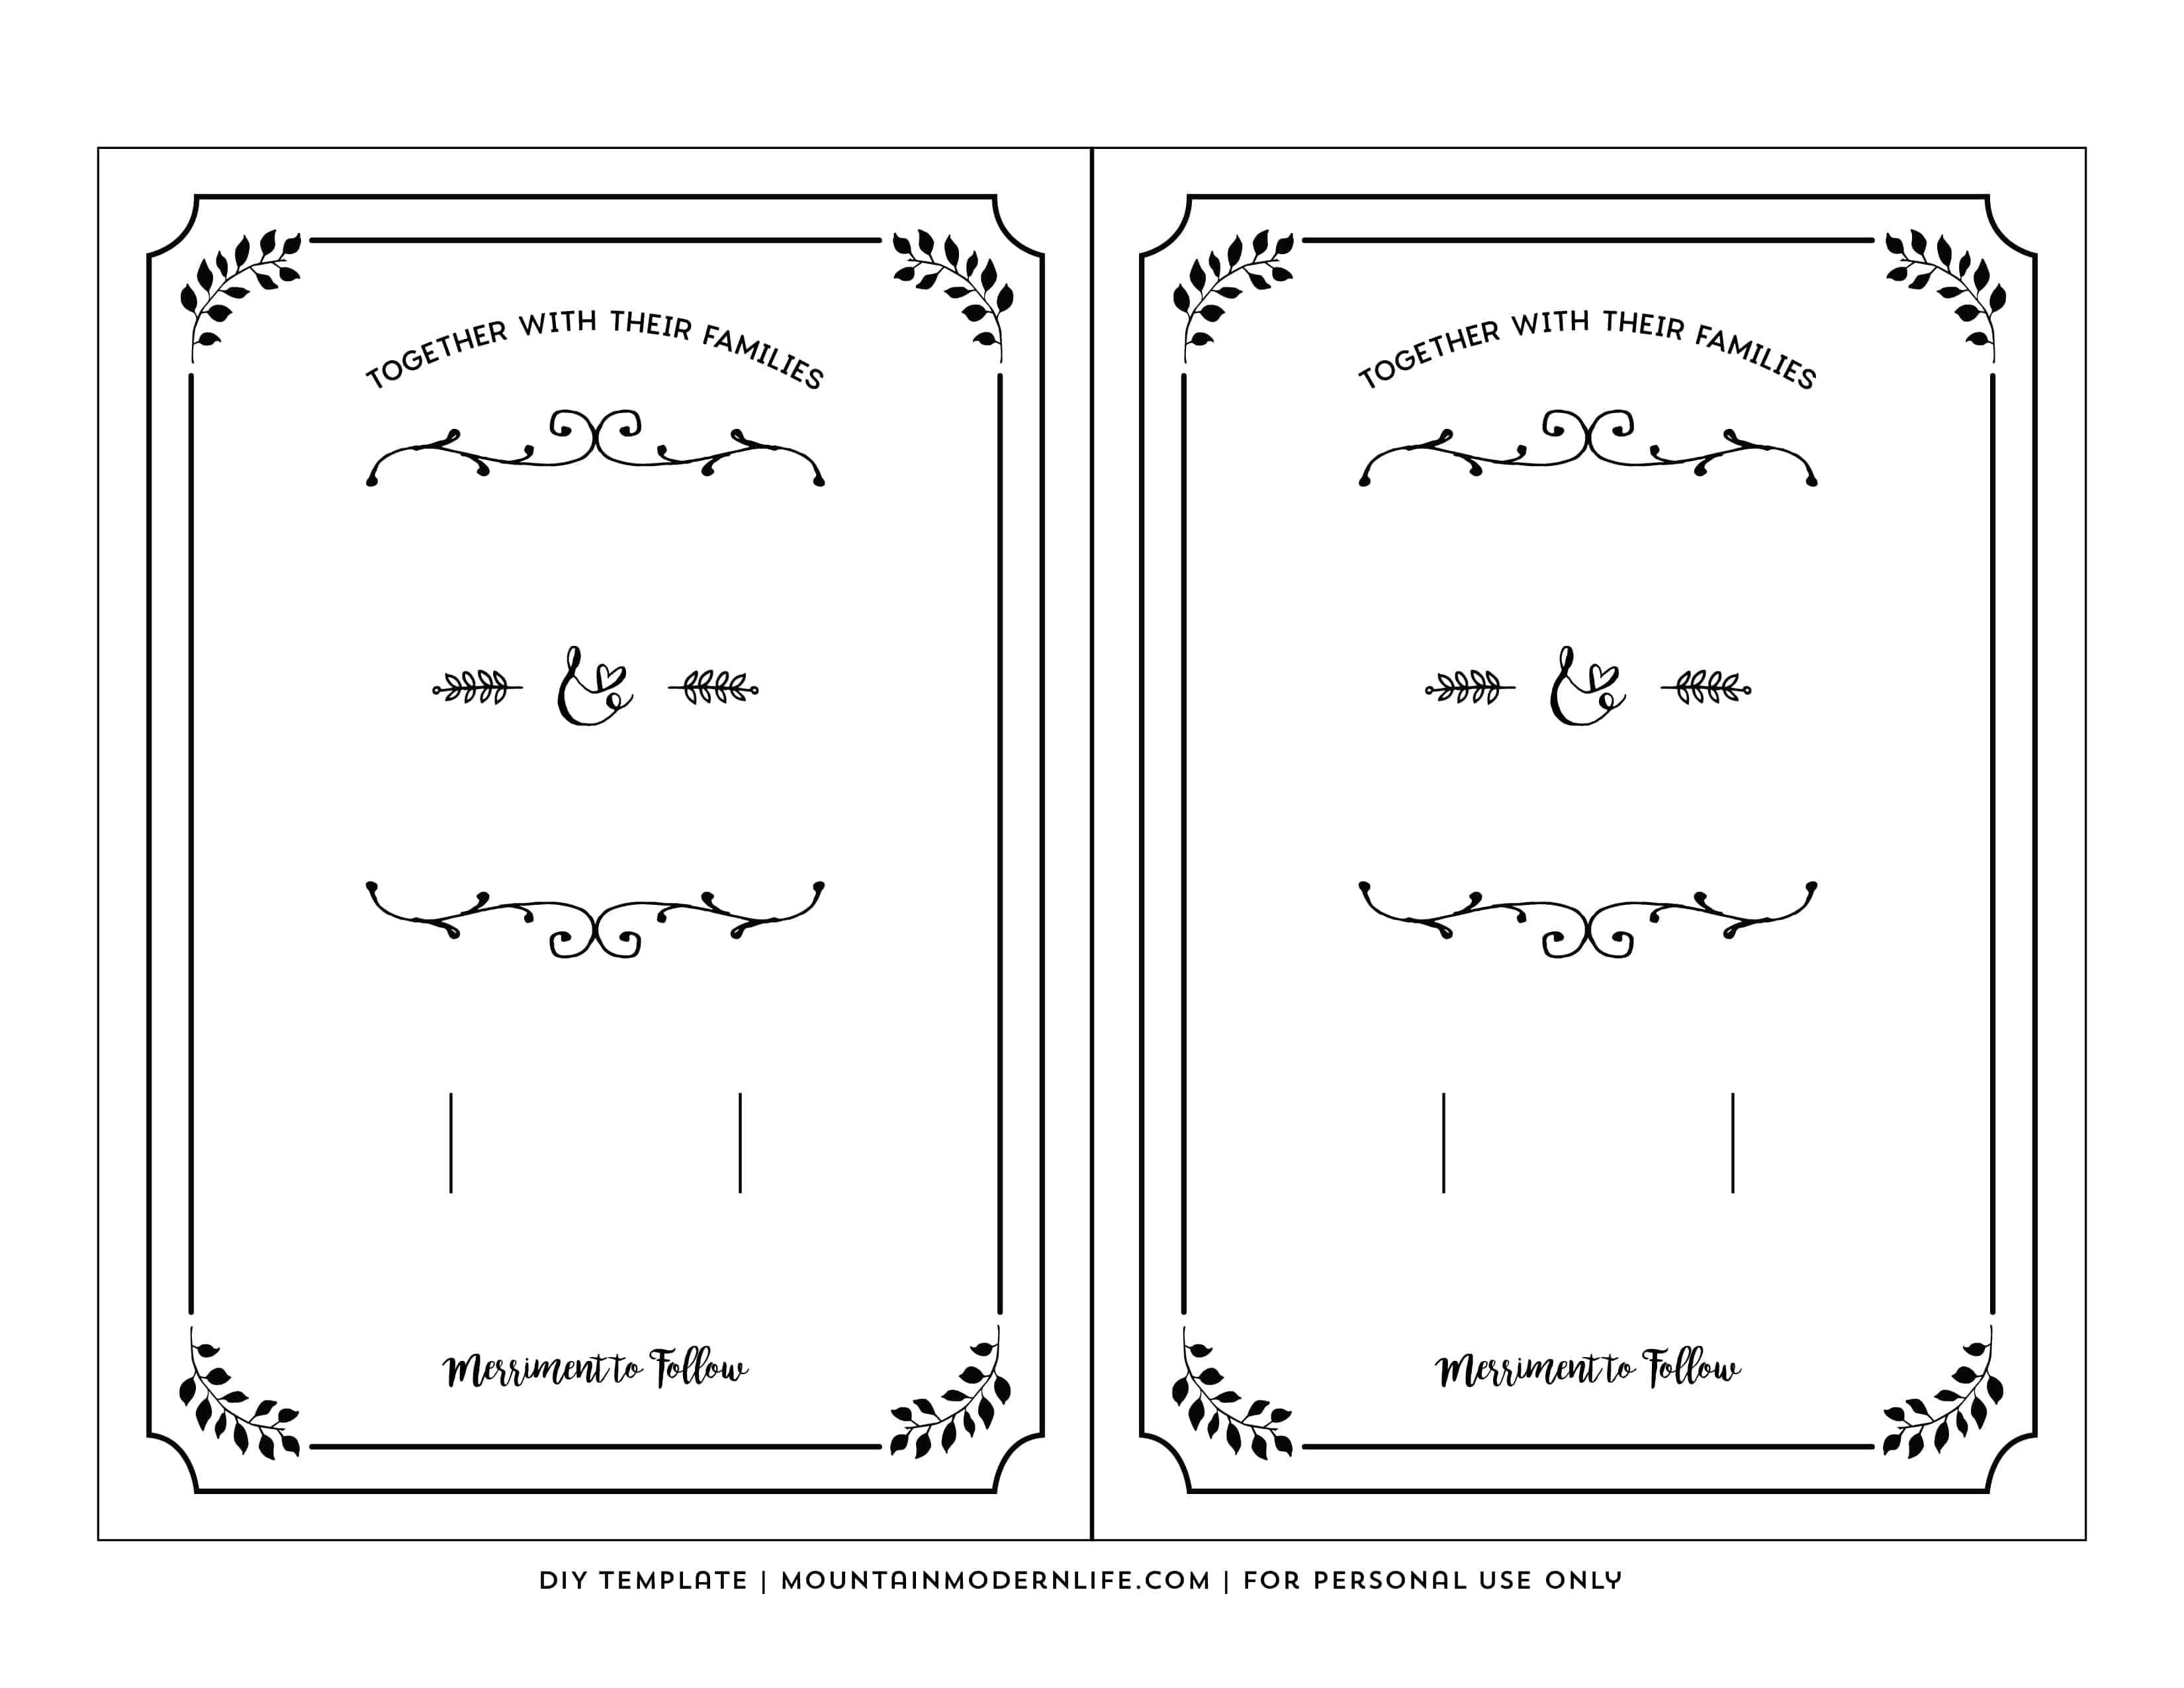 Free Printable Wedding Invitation Template - Free Printable Invitation Templates